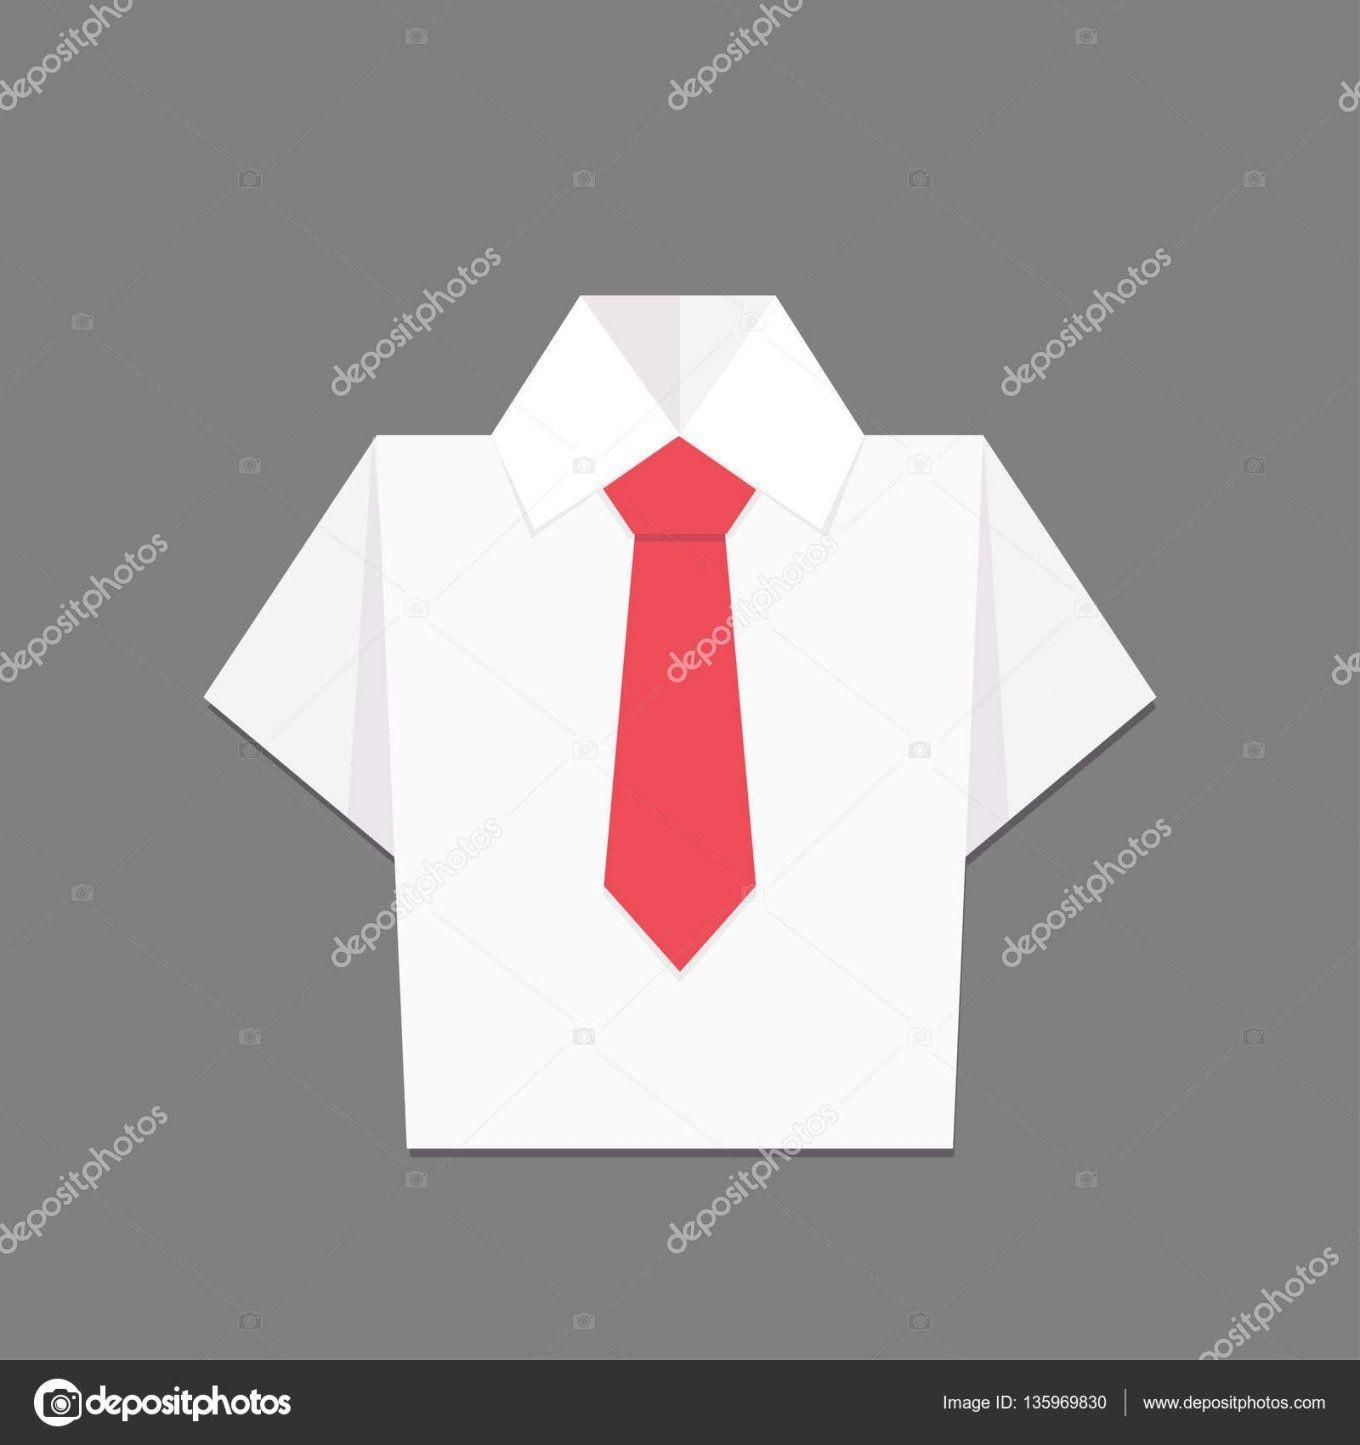 Hemd Mit Krawatte Origami Vektordesign — Stockvektor von Origami Hemd Mit Krawatte Photo